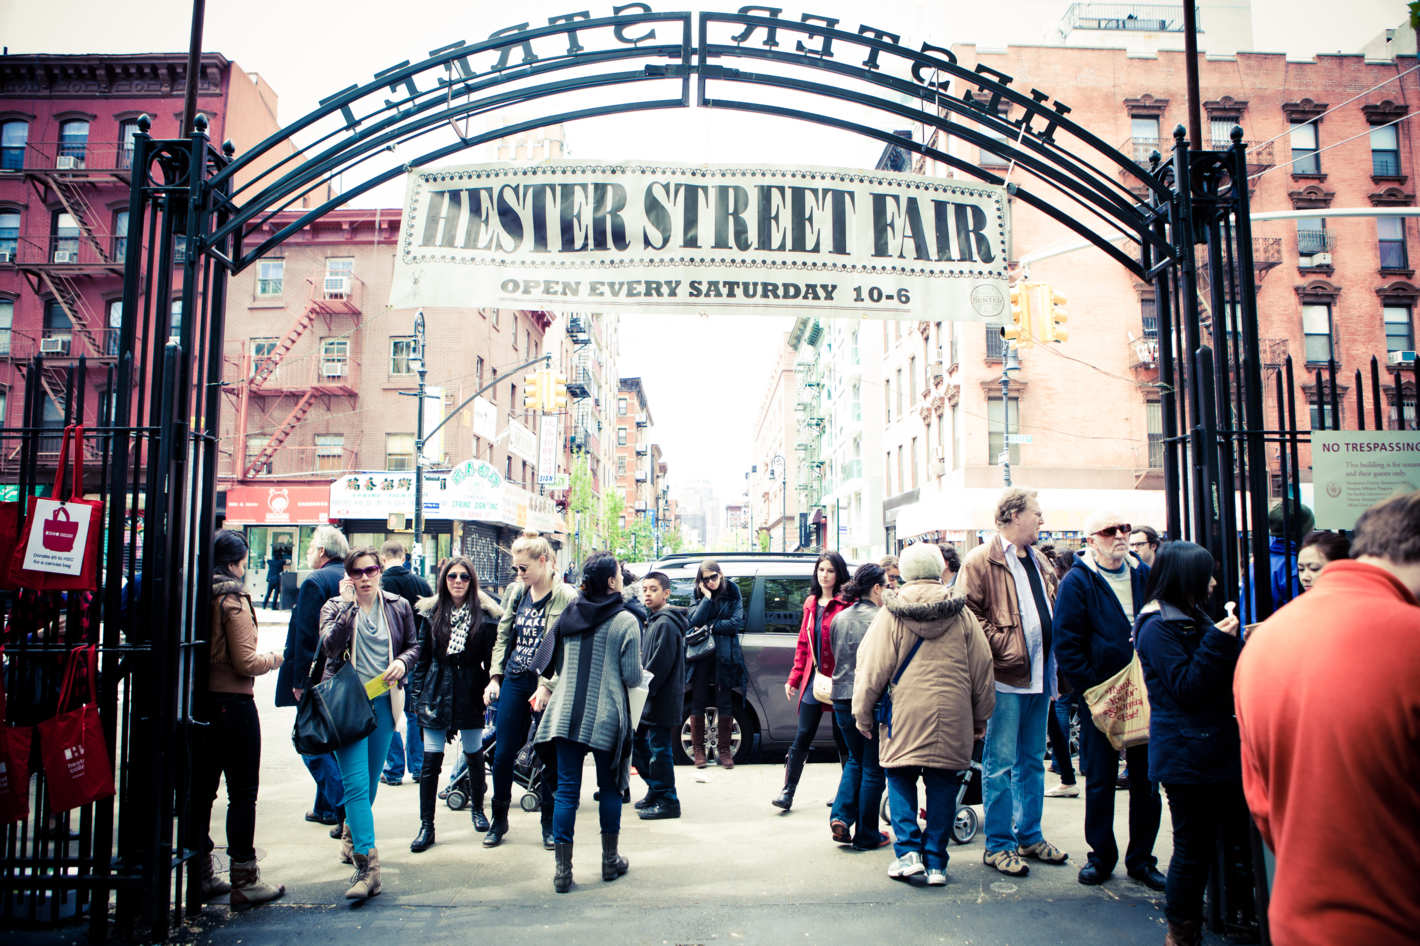 10-hester-street-fair.w710.h473.2x